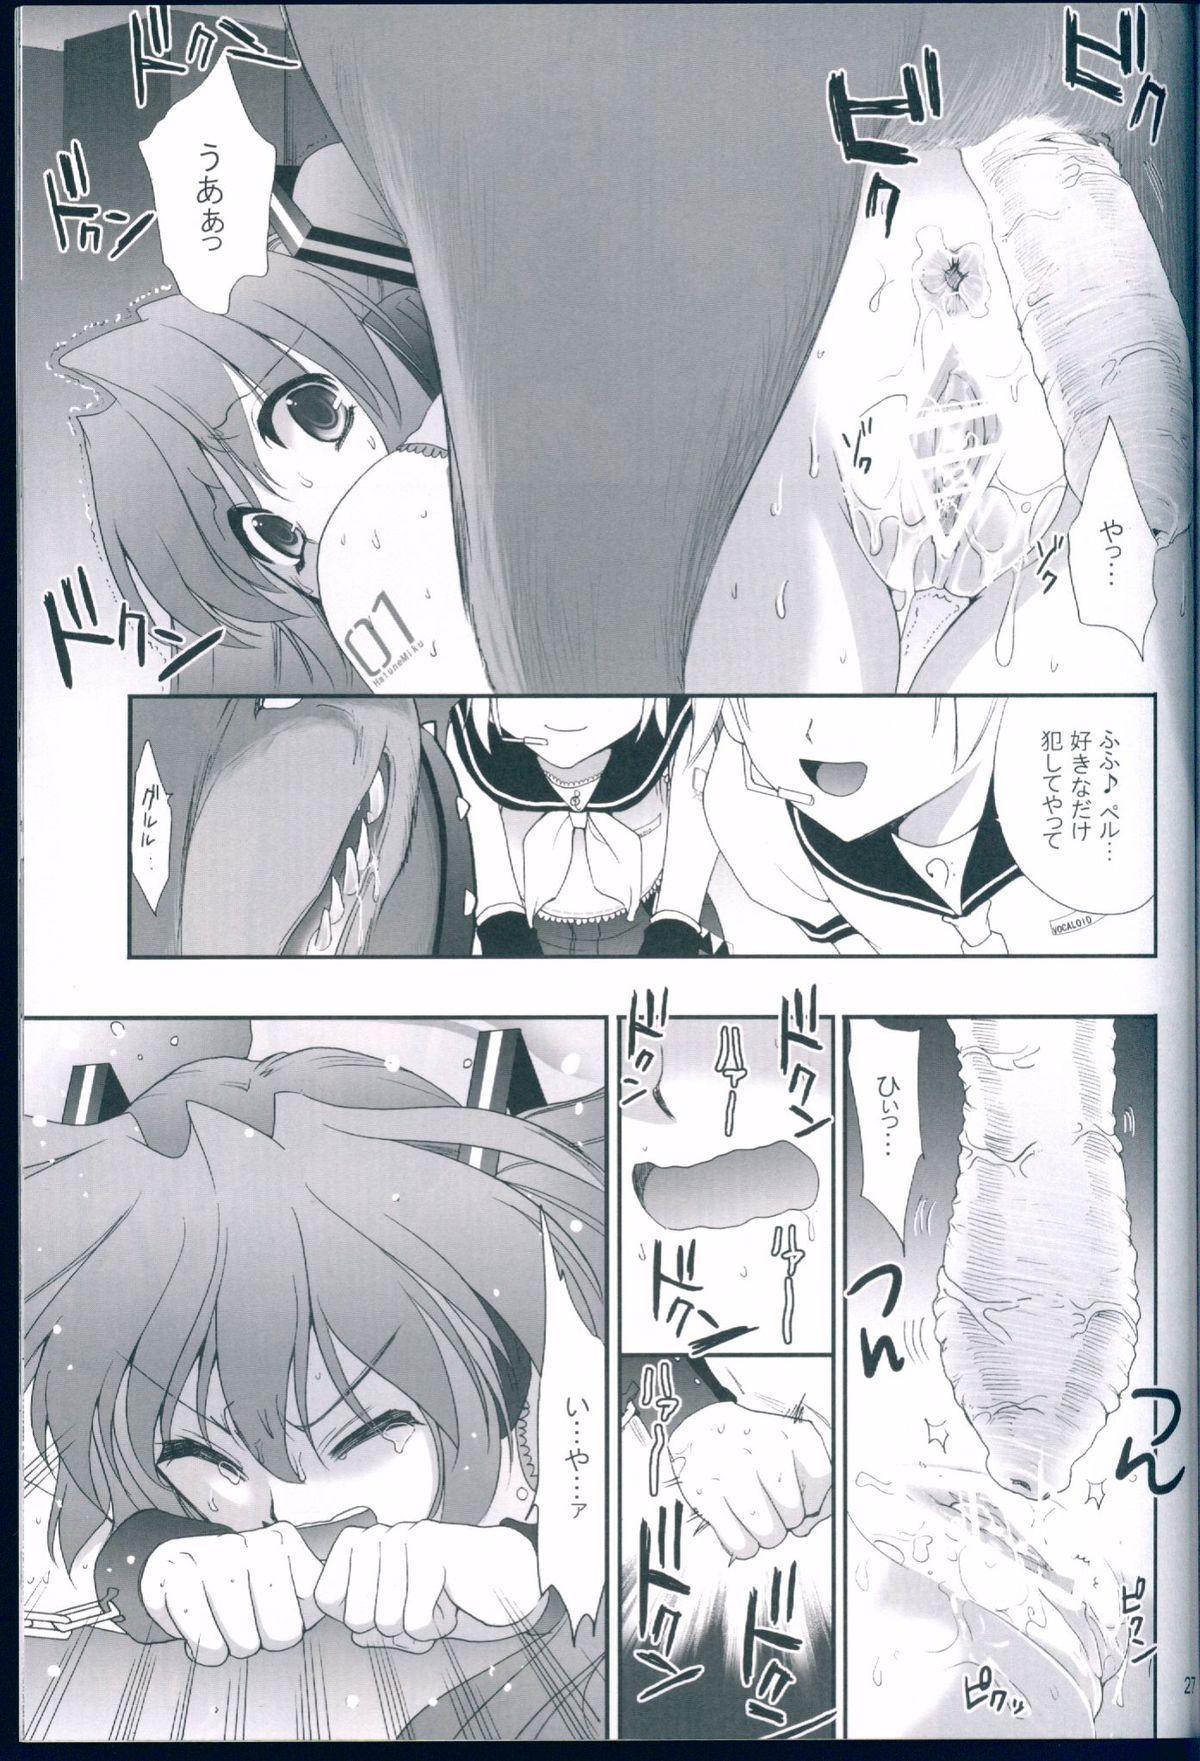 R Juu - Hatsune Miku Kenkan 26